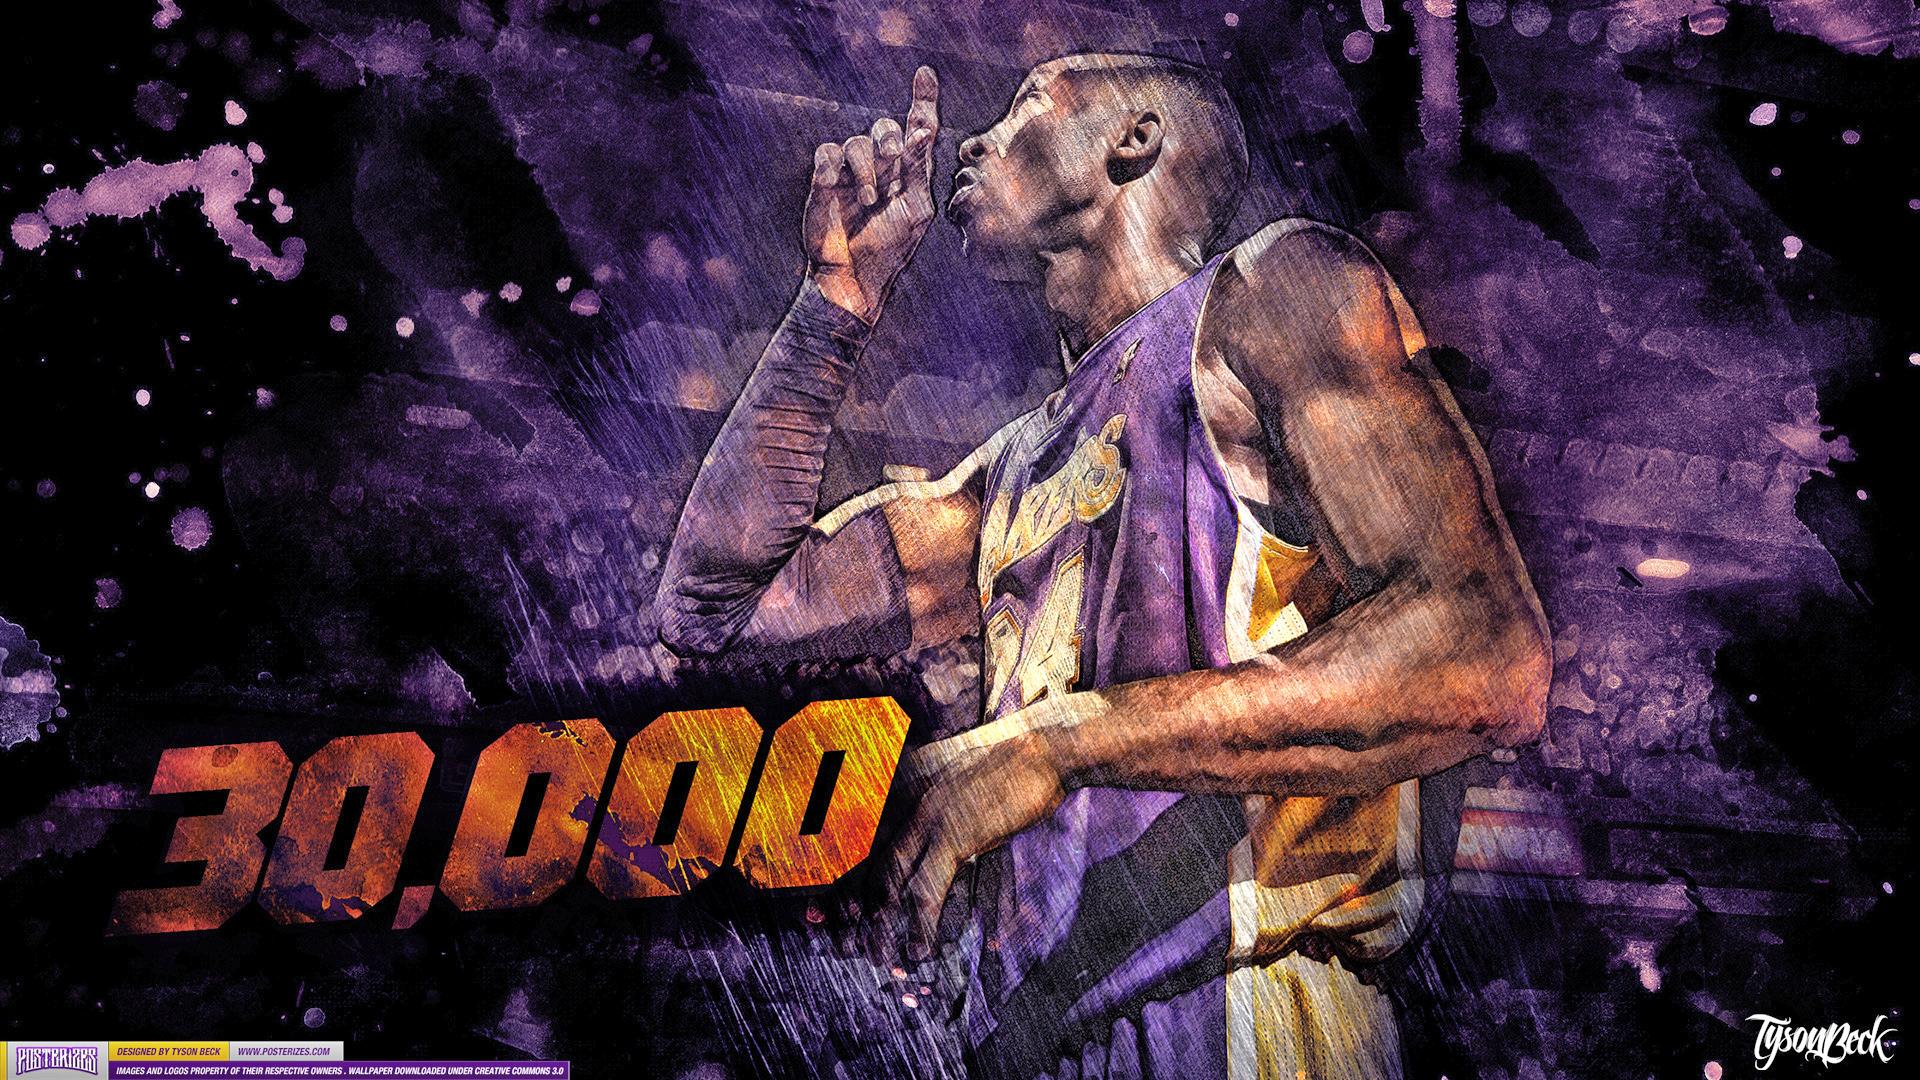 Kobe Bryant Full HD Wallpaper And Background Image